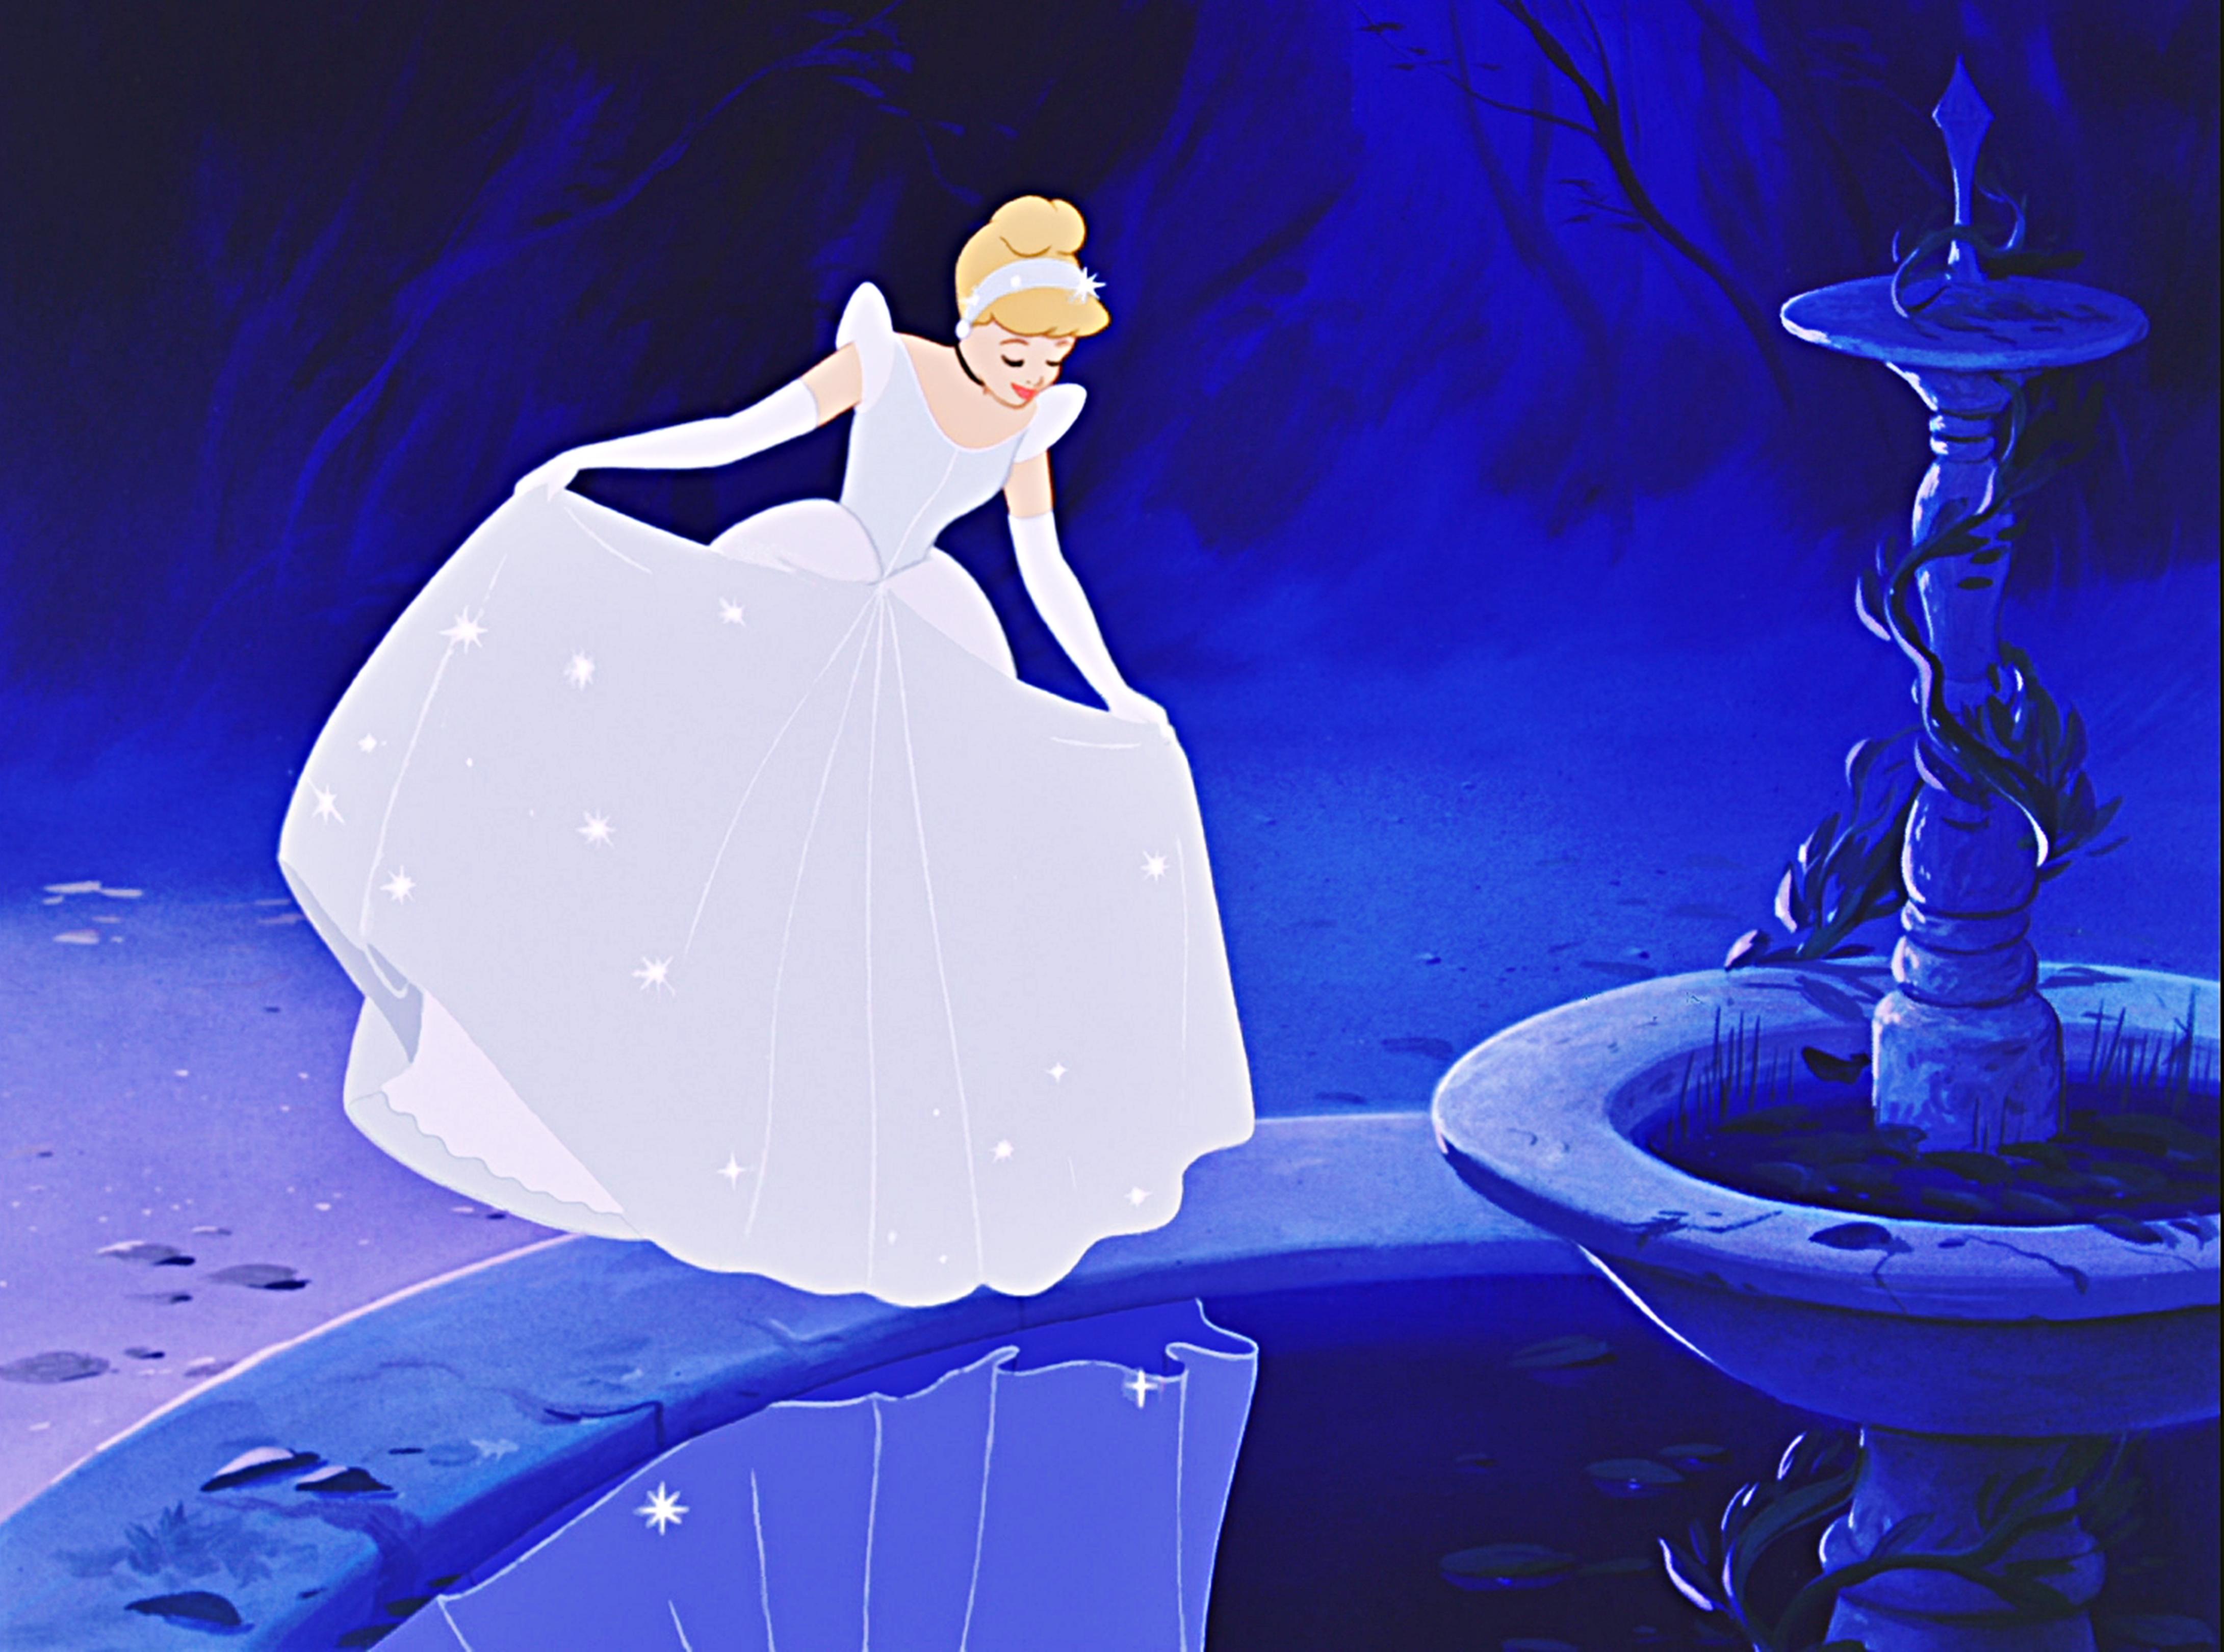 Walt Disney Screencaps